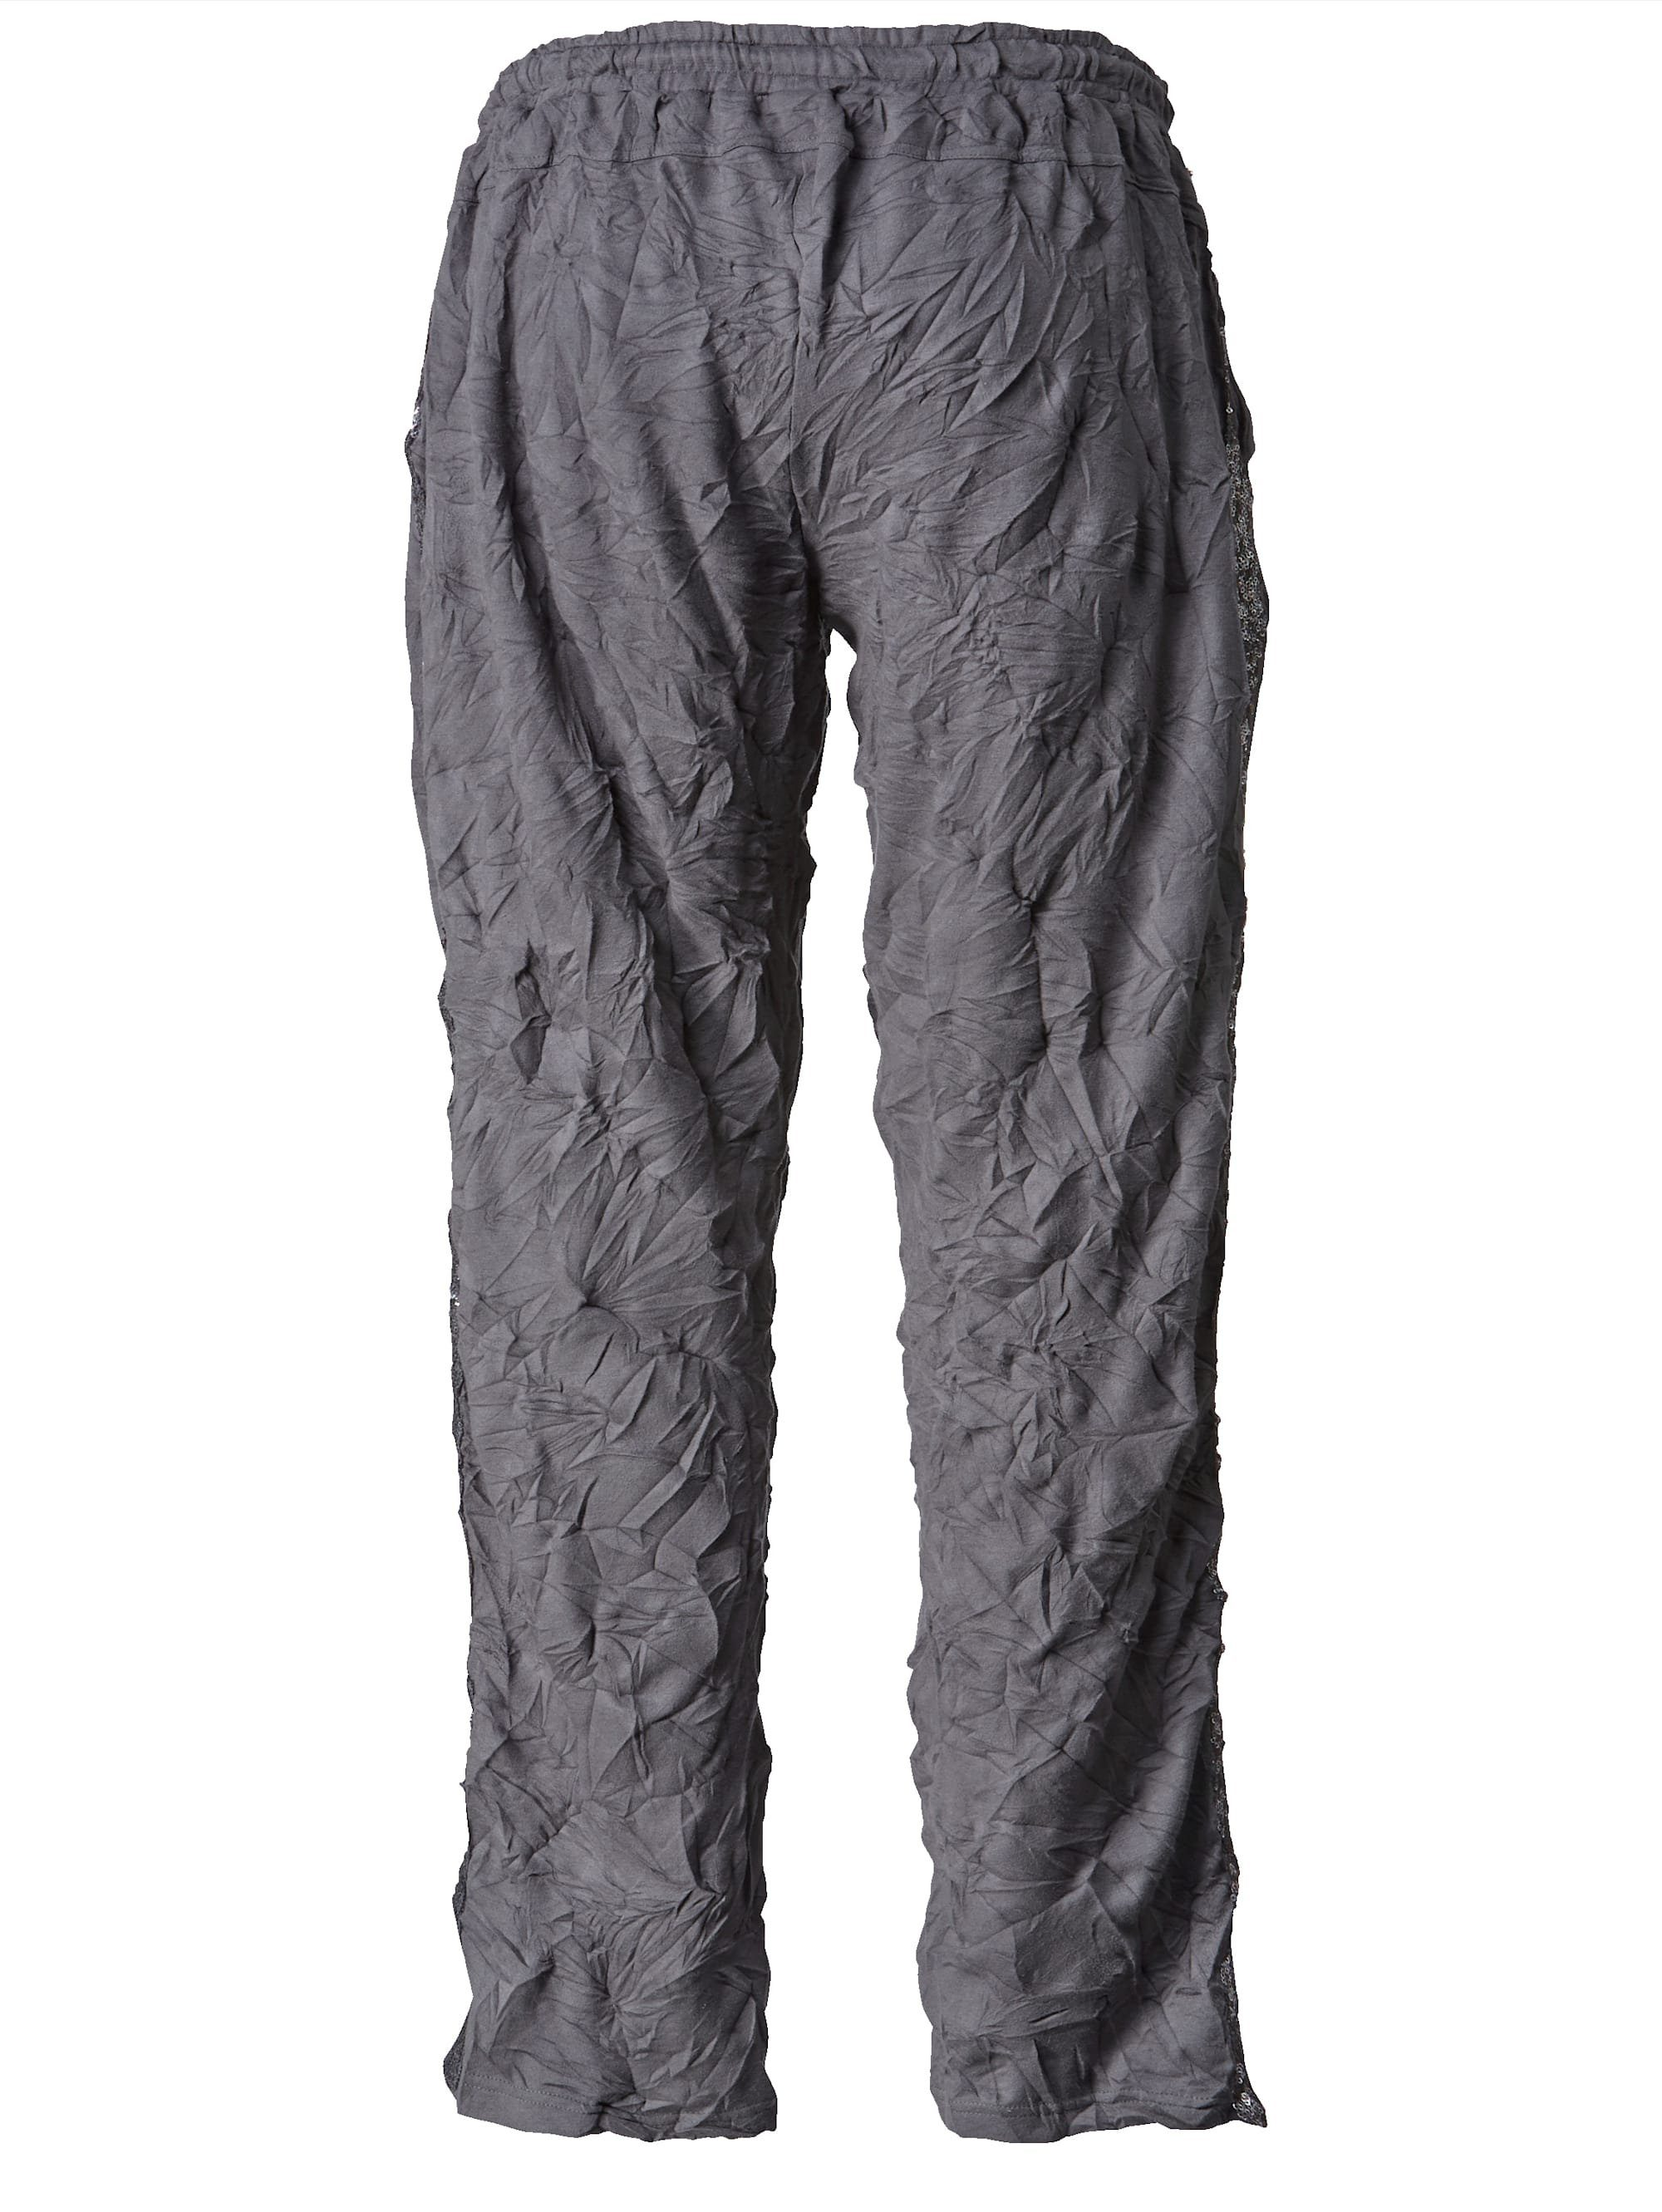 Angel of Style by Happy Size Jogpant, Jogpants-Style mit Stretchbund, Tunnelzug und 2 Taschen